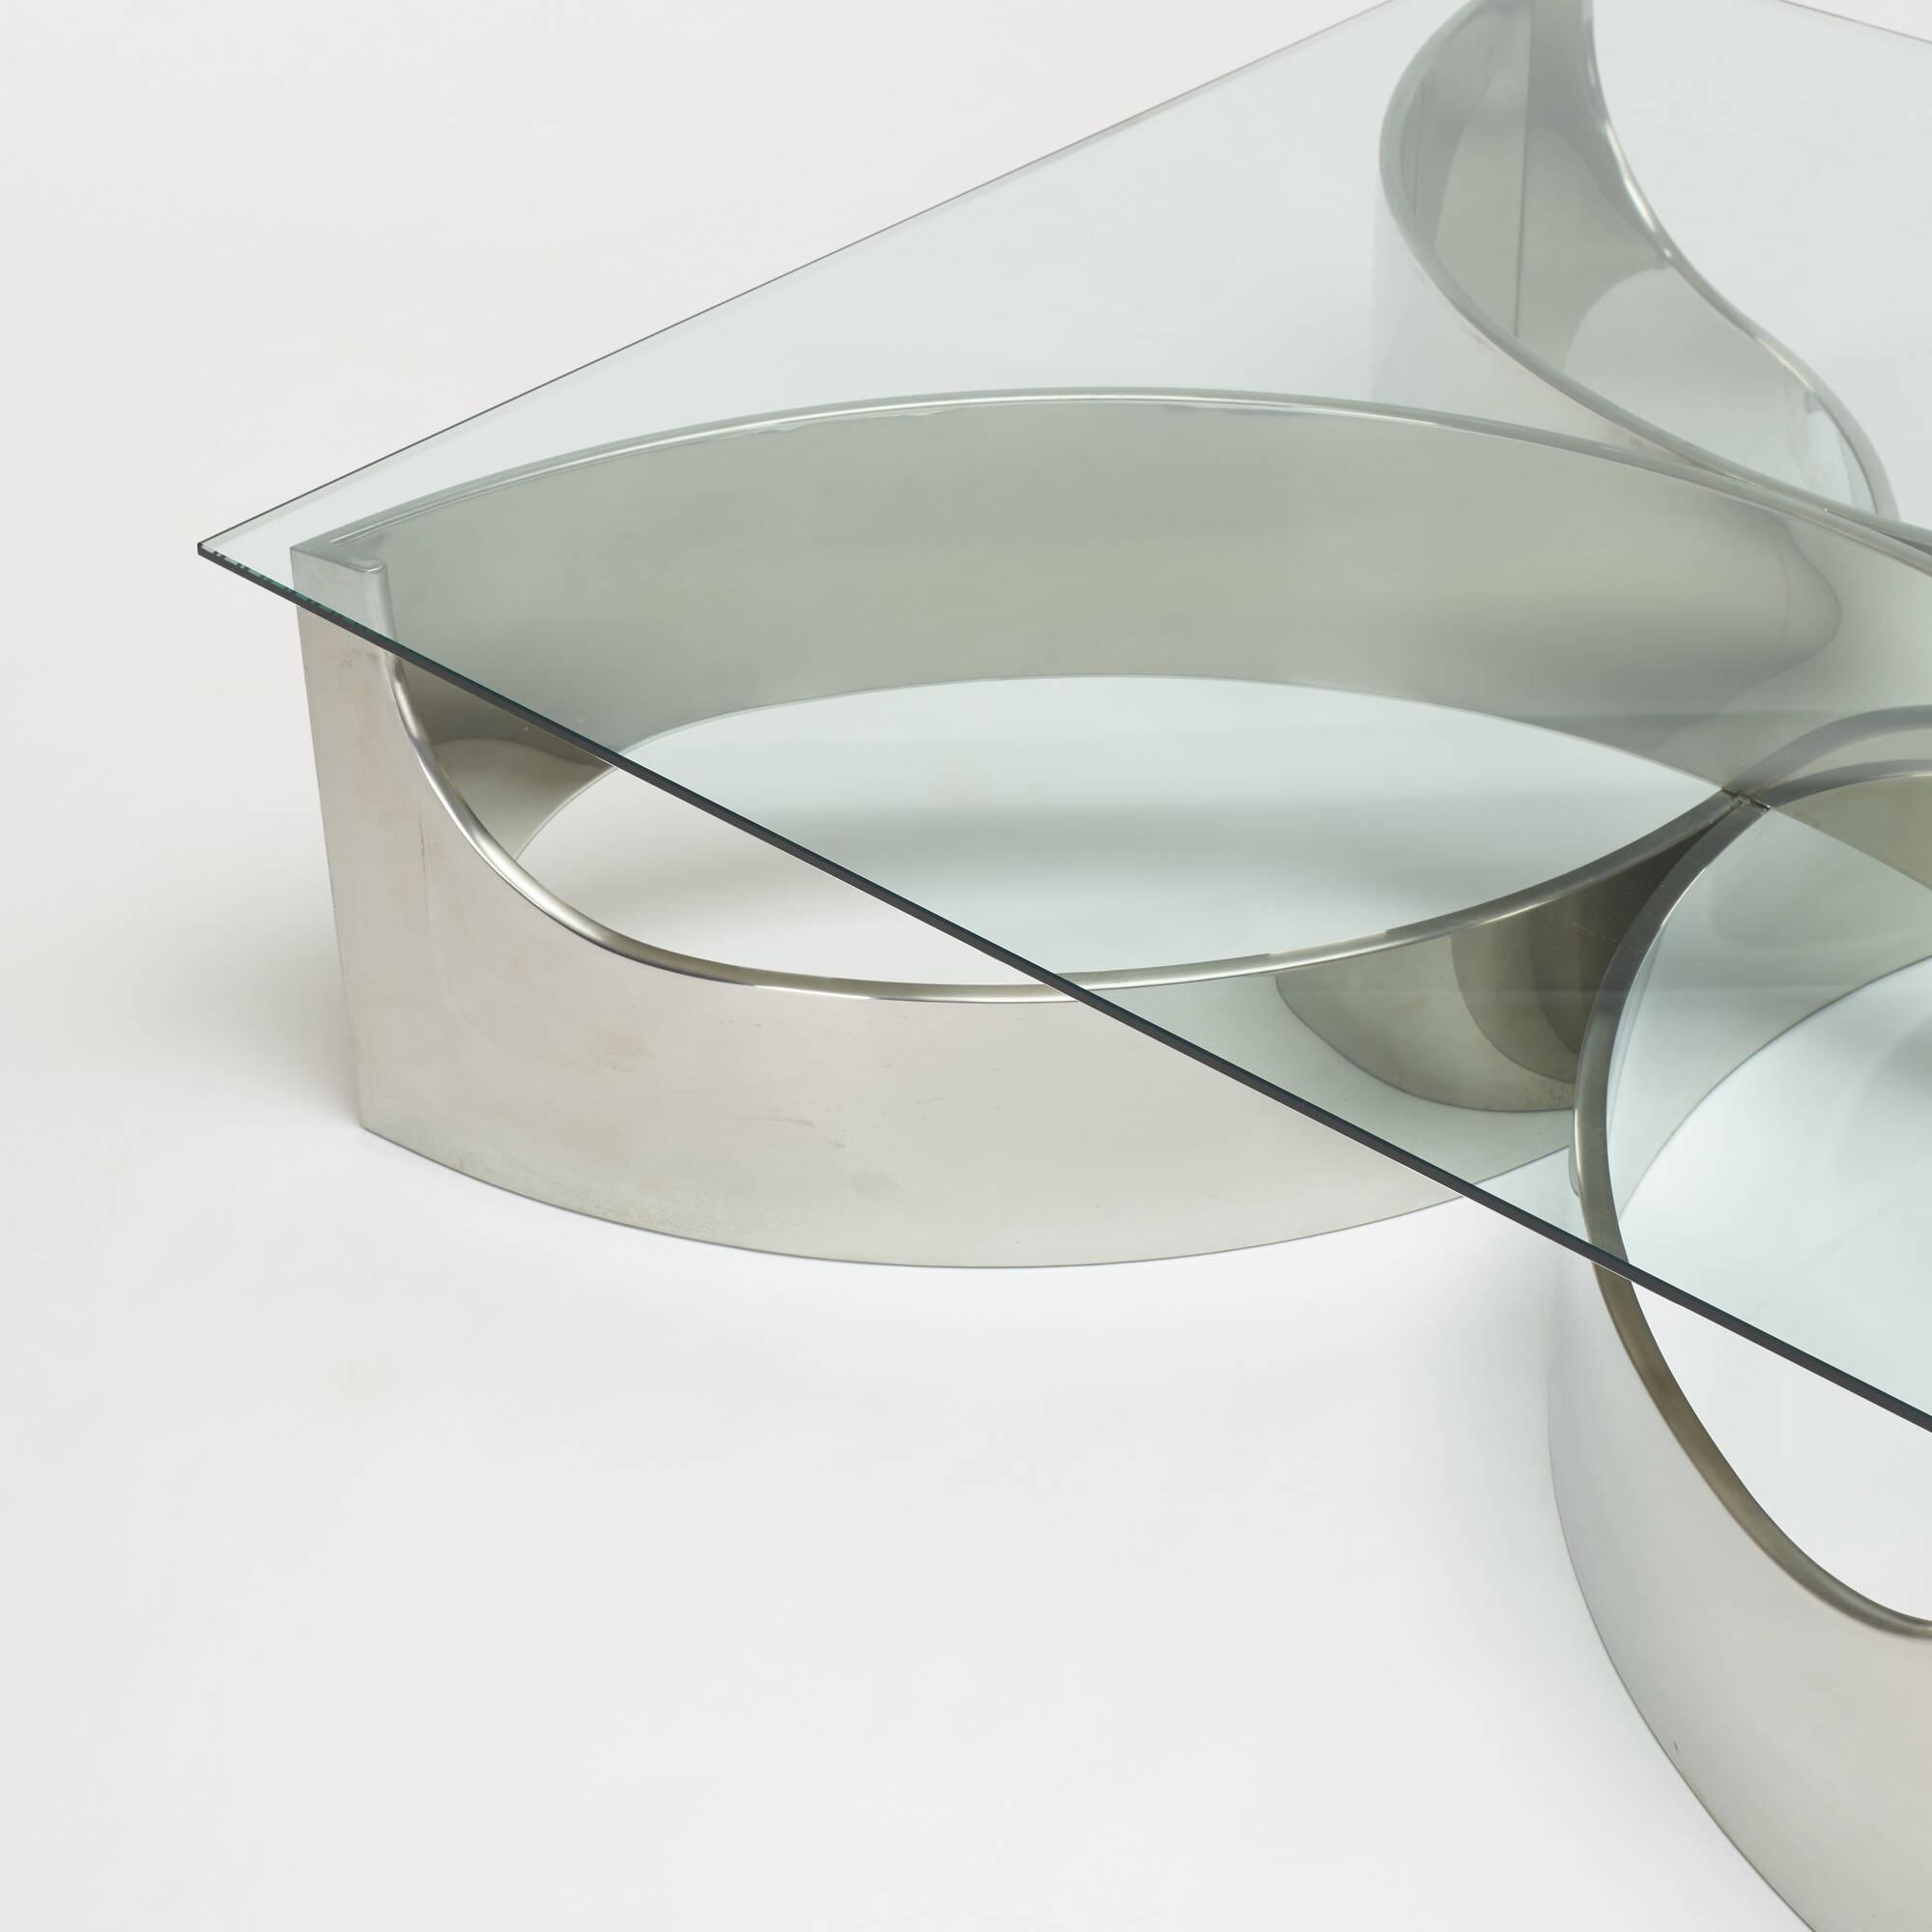 337: Maxform / coffee table (2 of 3)